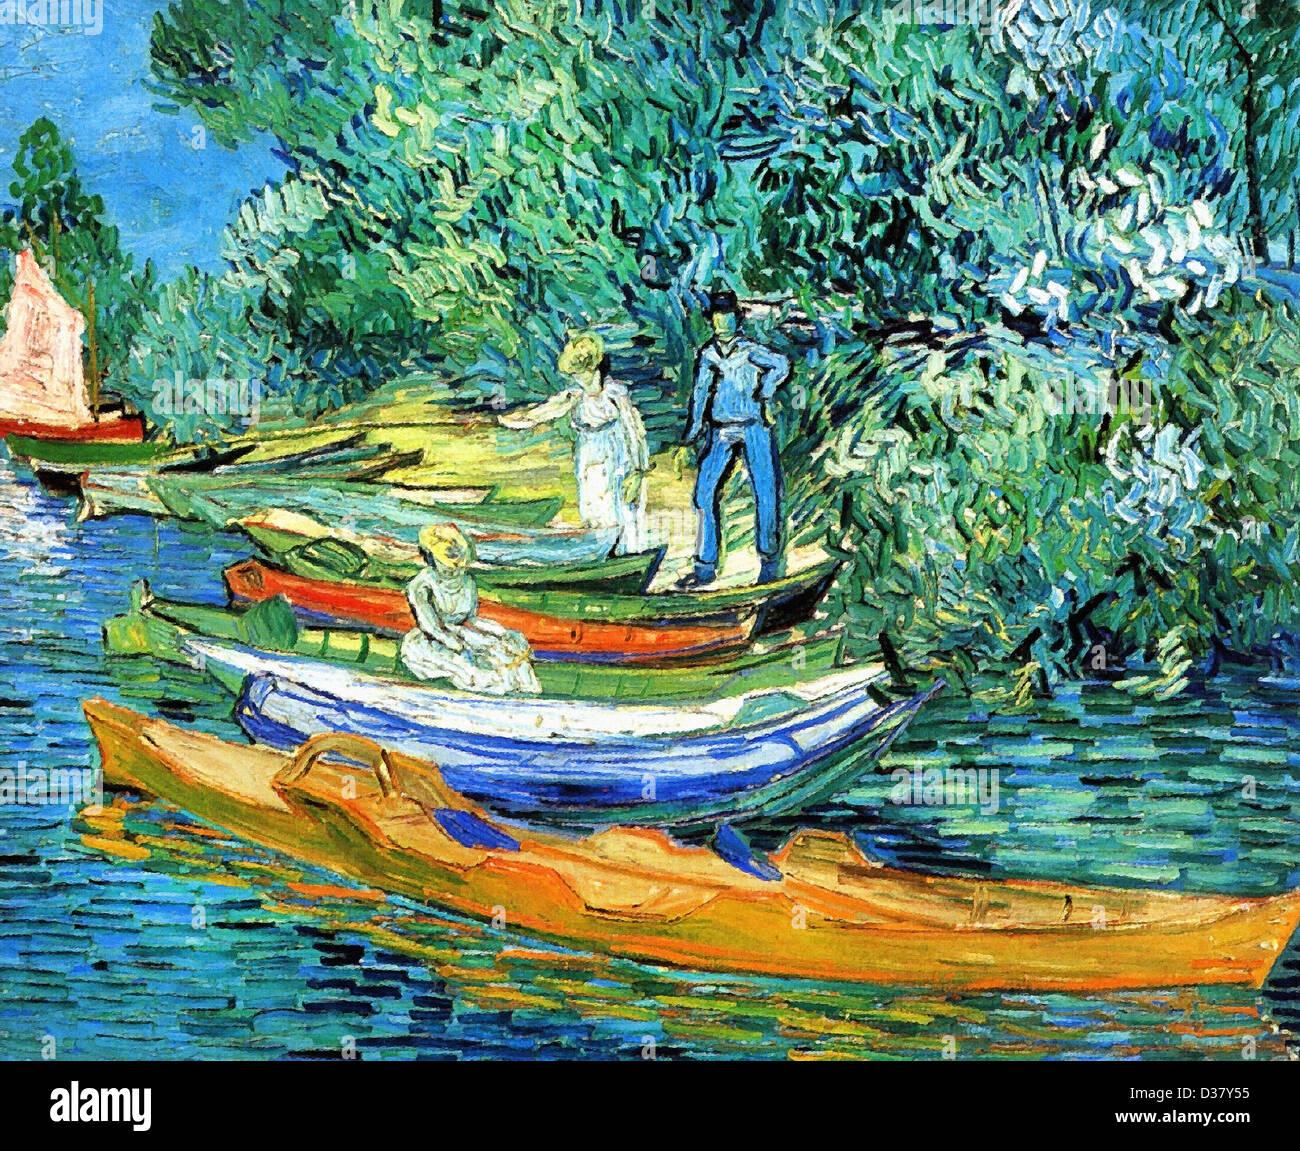 Vincent van Gogh, botes a remo a orillas del Oise. 1890. Posimpresionismo. Óleo sobre lienzo. Imagen De Stock